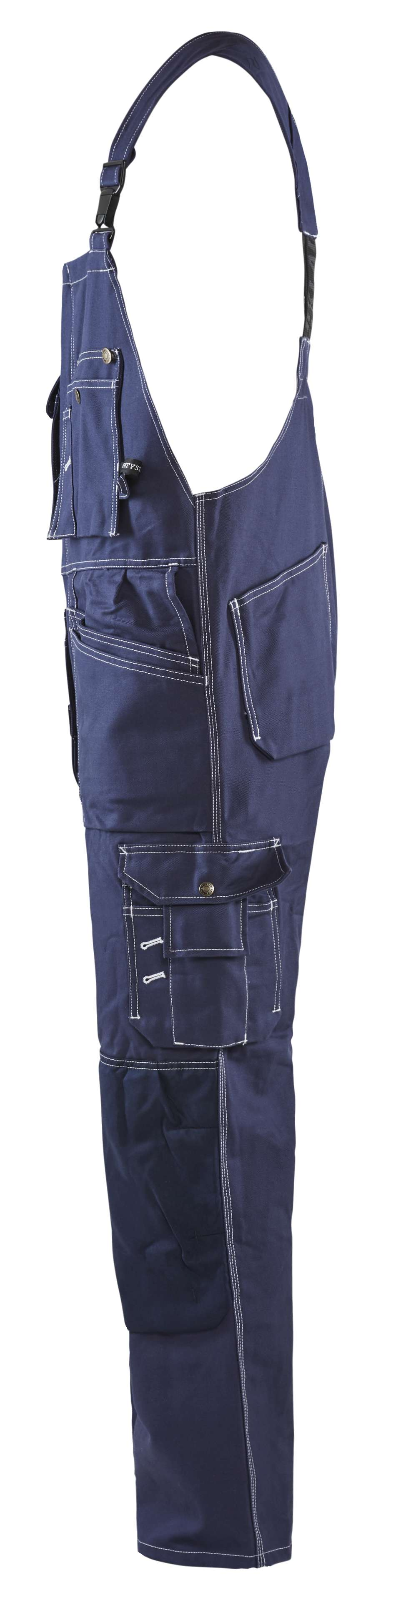 Blaklader Amerikaanse overalls 26001370 marineblauw(8800)